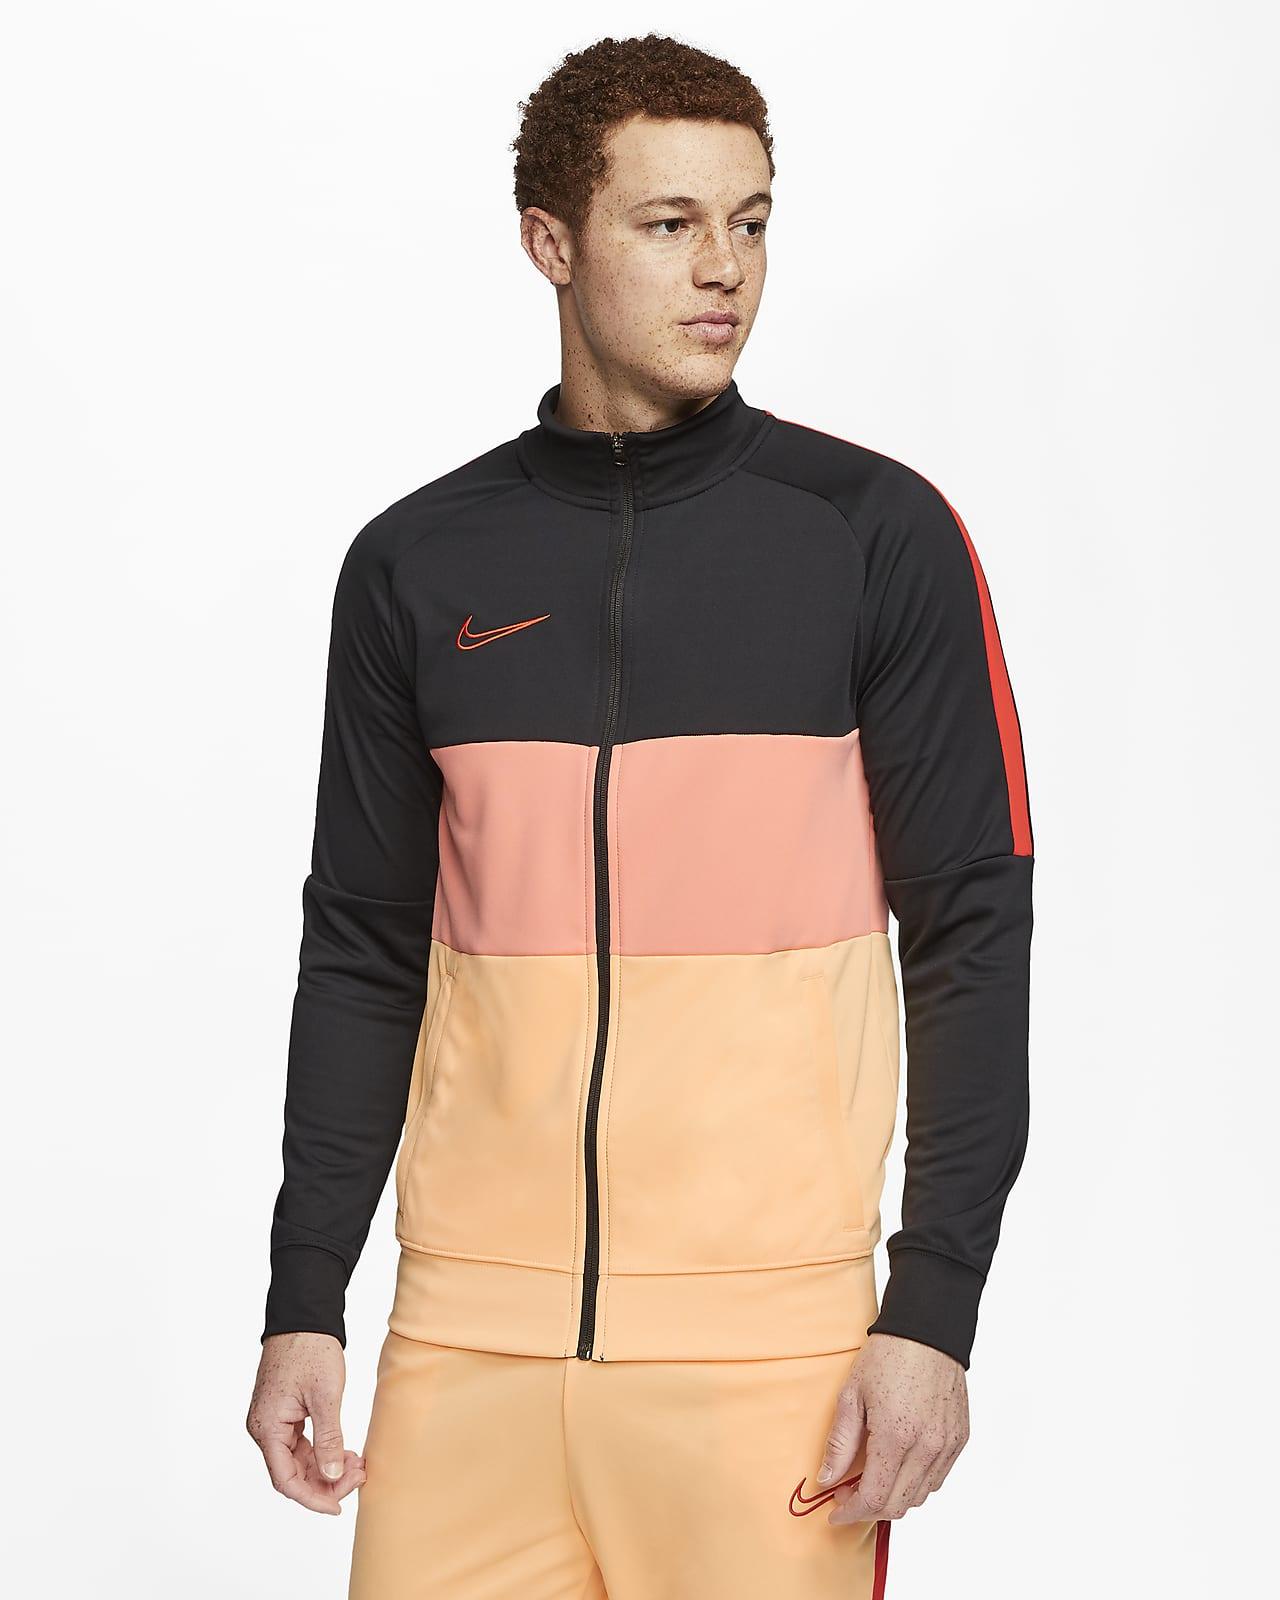 Nike Dri-FIT Academy Germany Men's Football Jacket